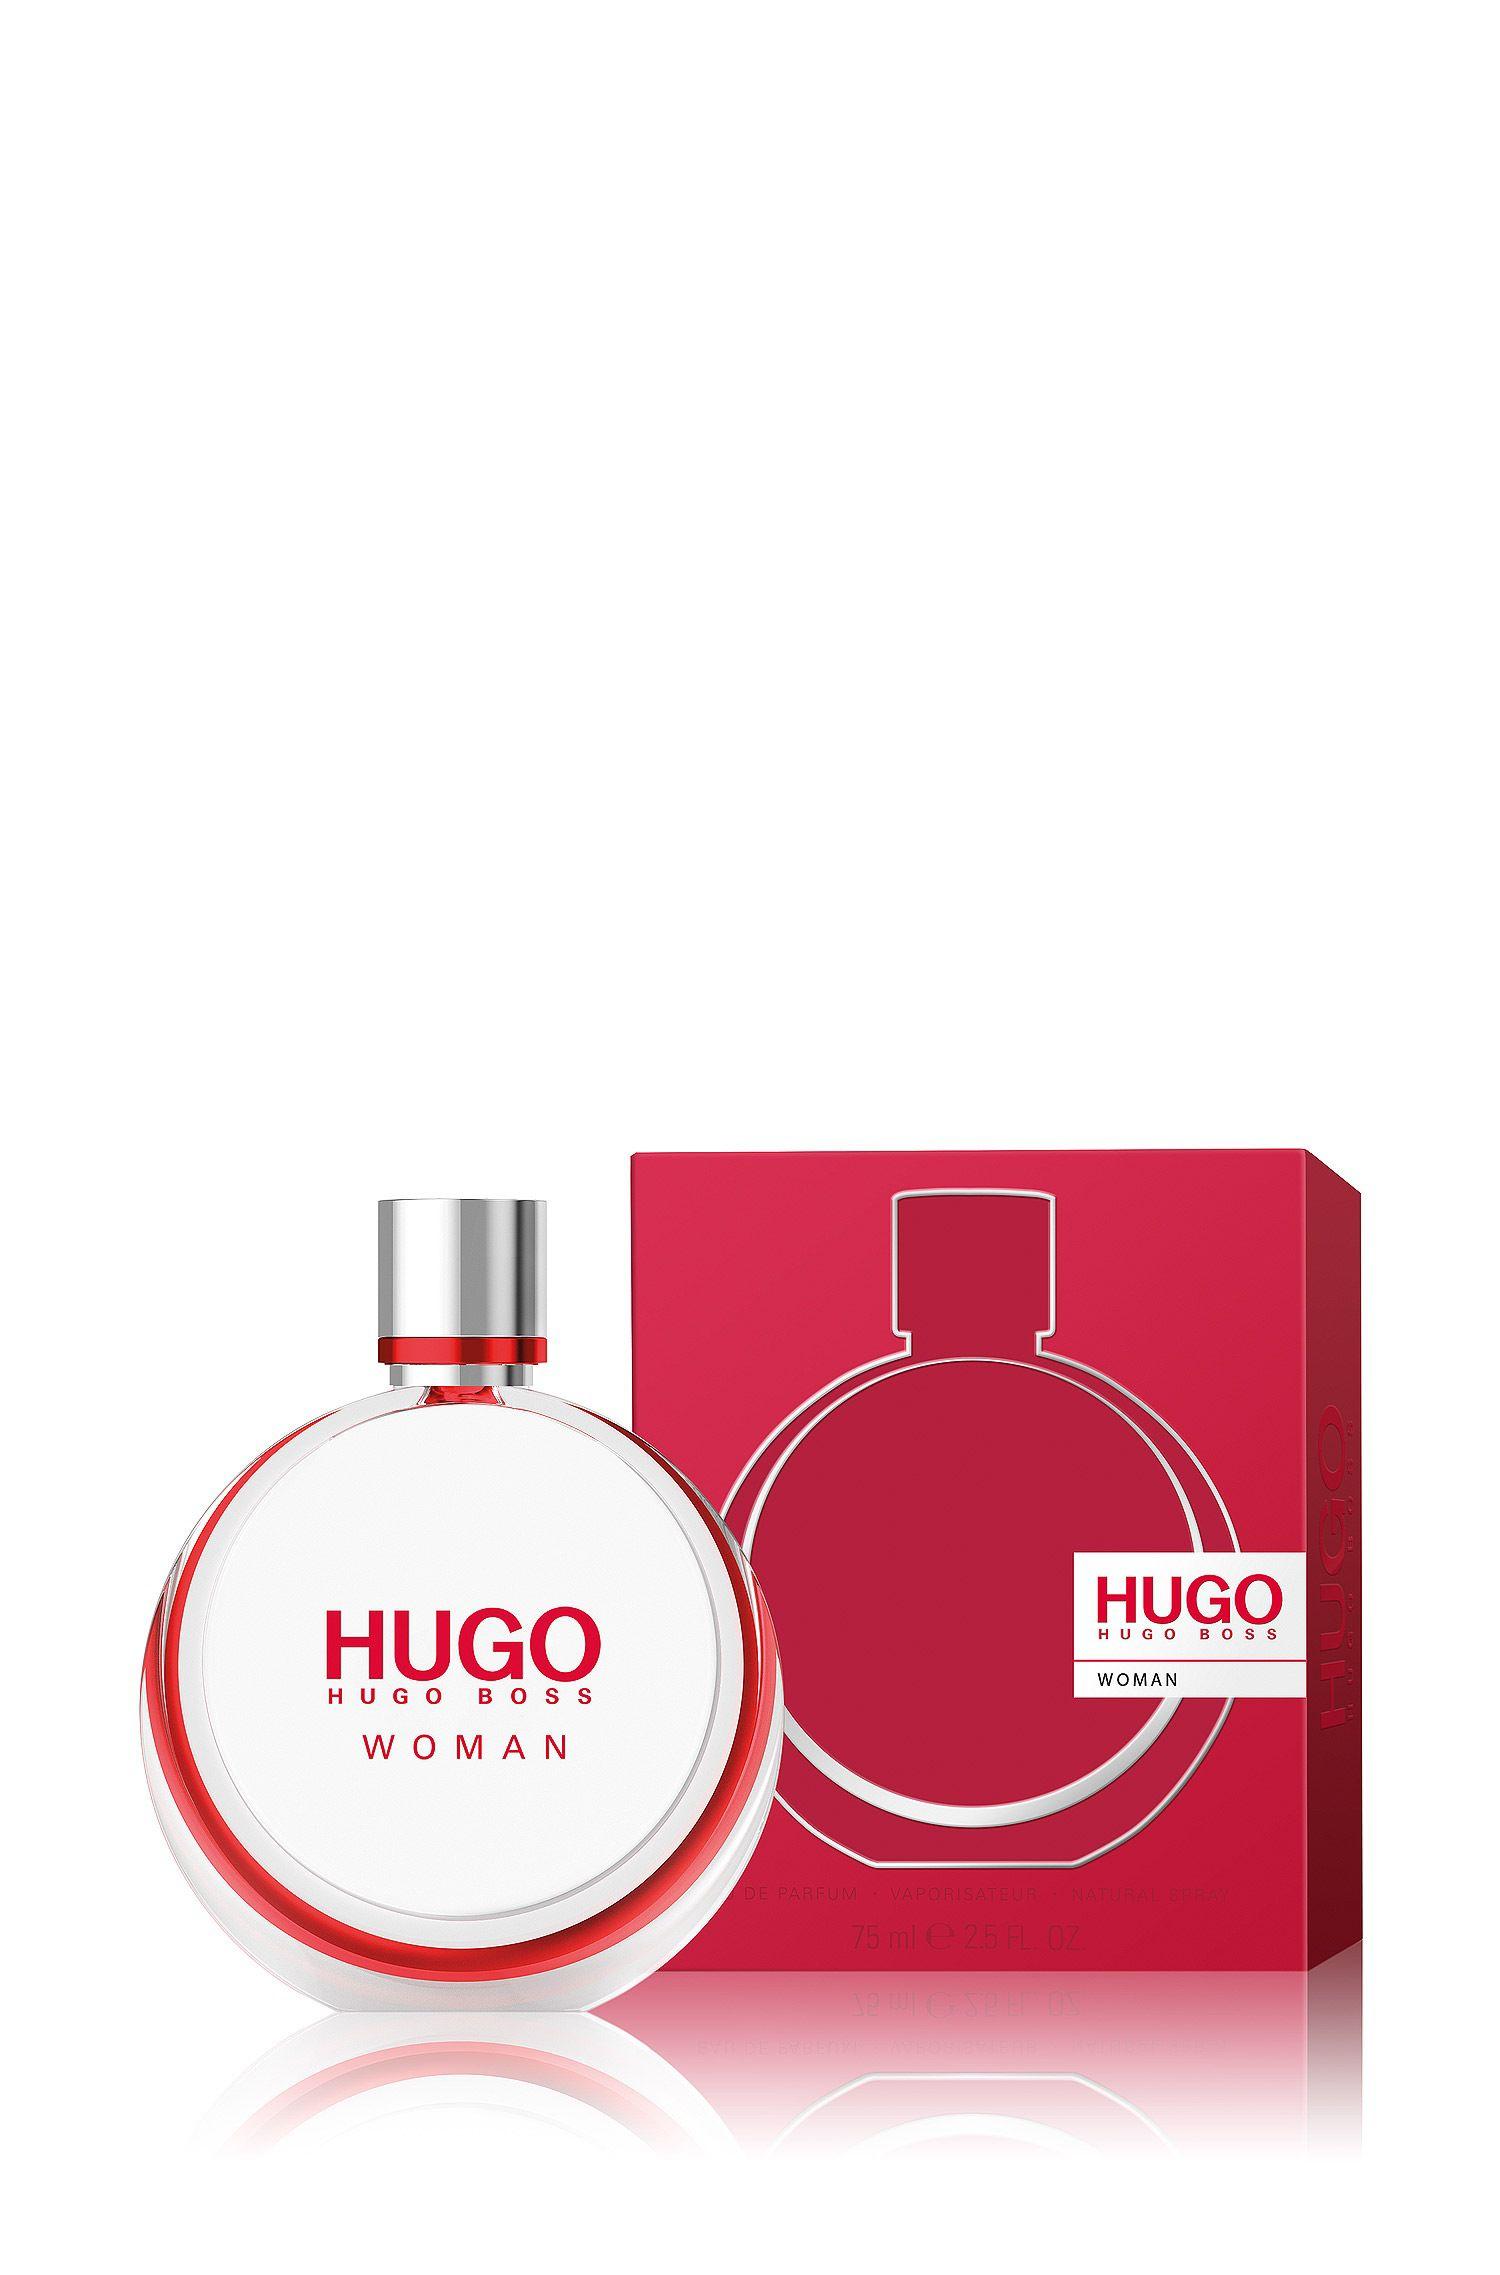 2.5 oz (75 mL) Eau de Parfum   HUGO Woman